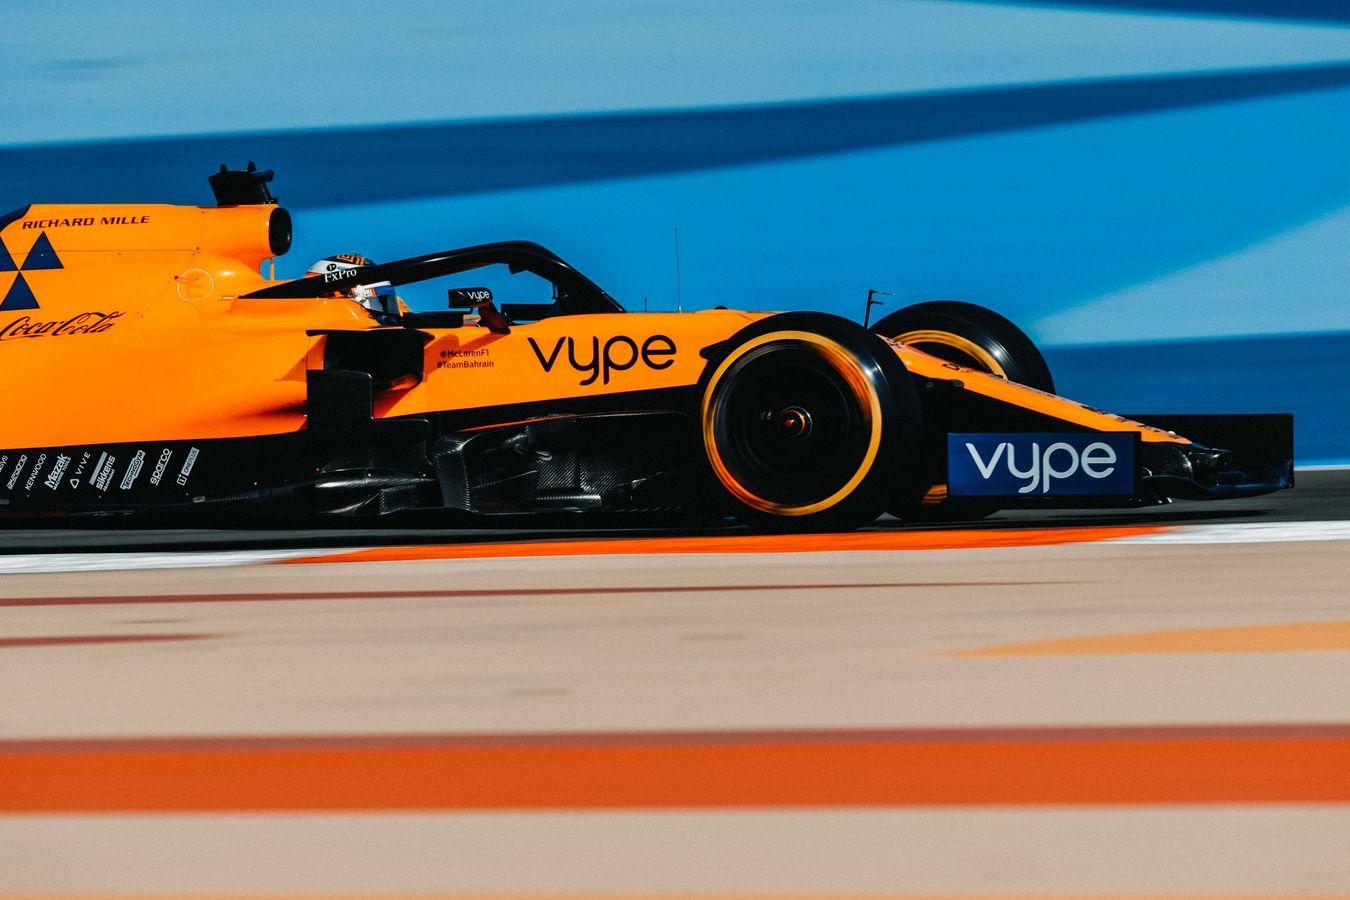 Mclaren Racing 2019 Bahrain Grand Prix Qualifying